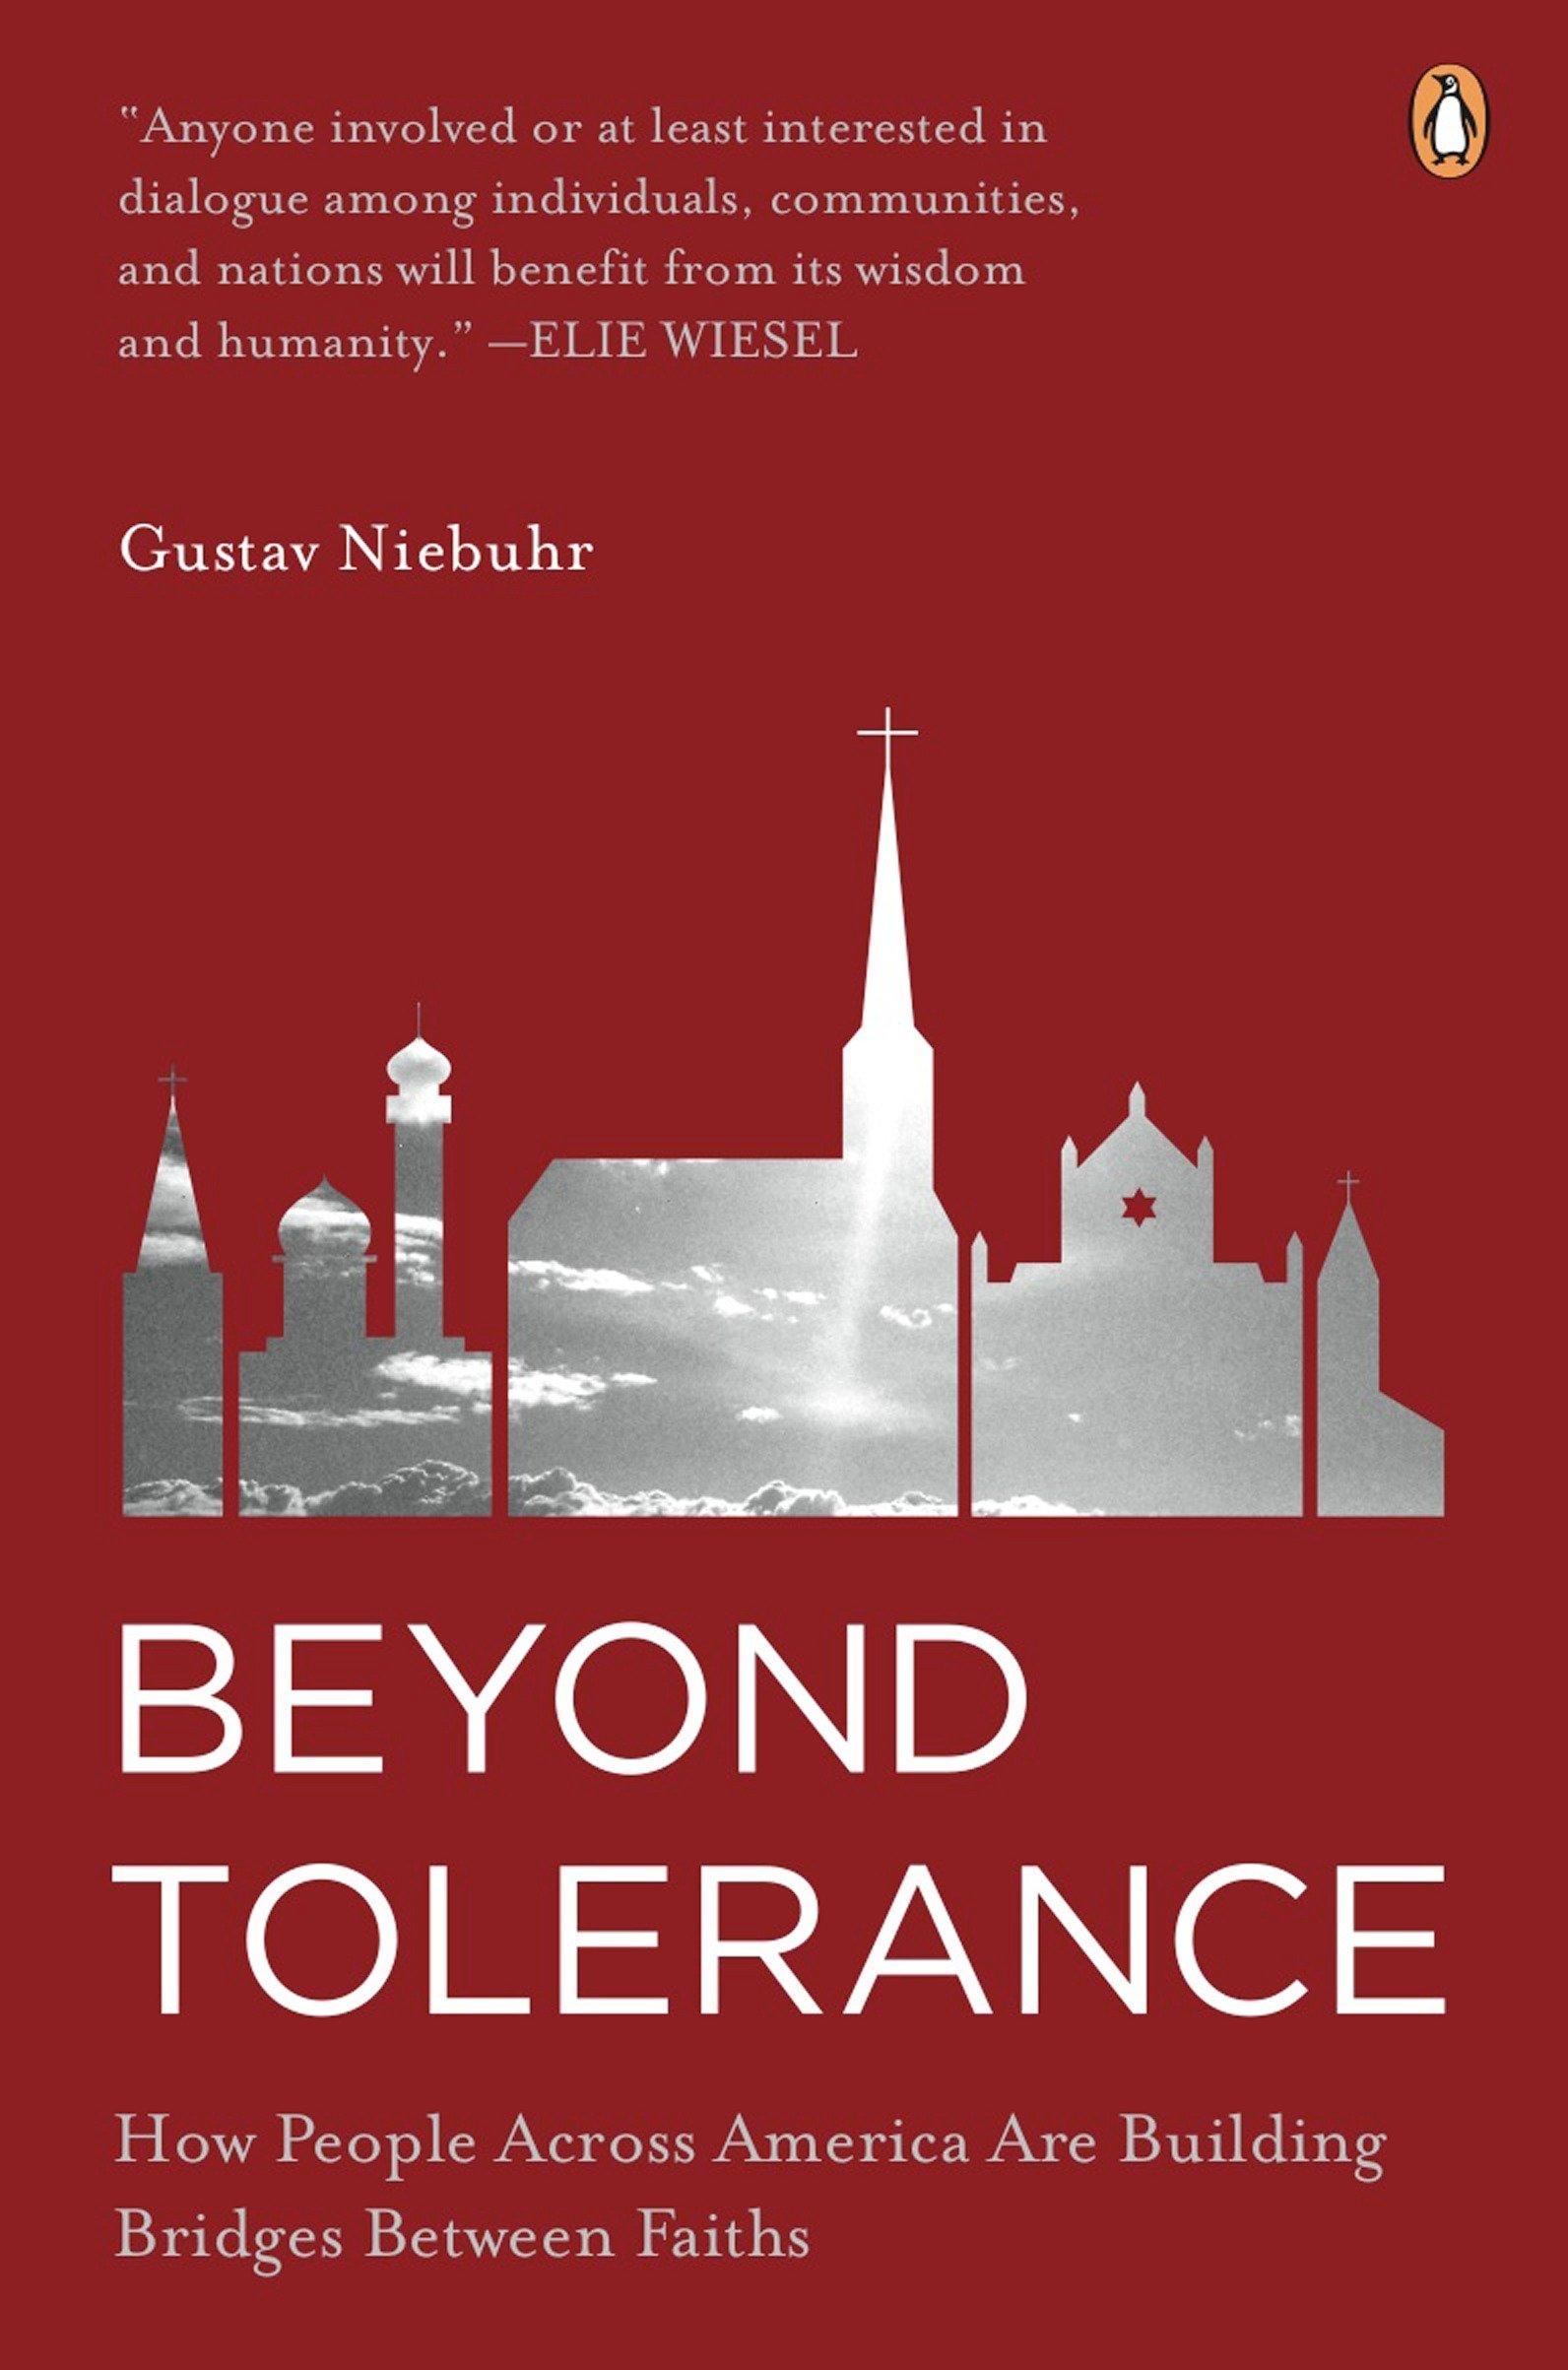 Beyond Tolerance: How People Across America Are Building Bridges Between Faiths pdf